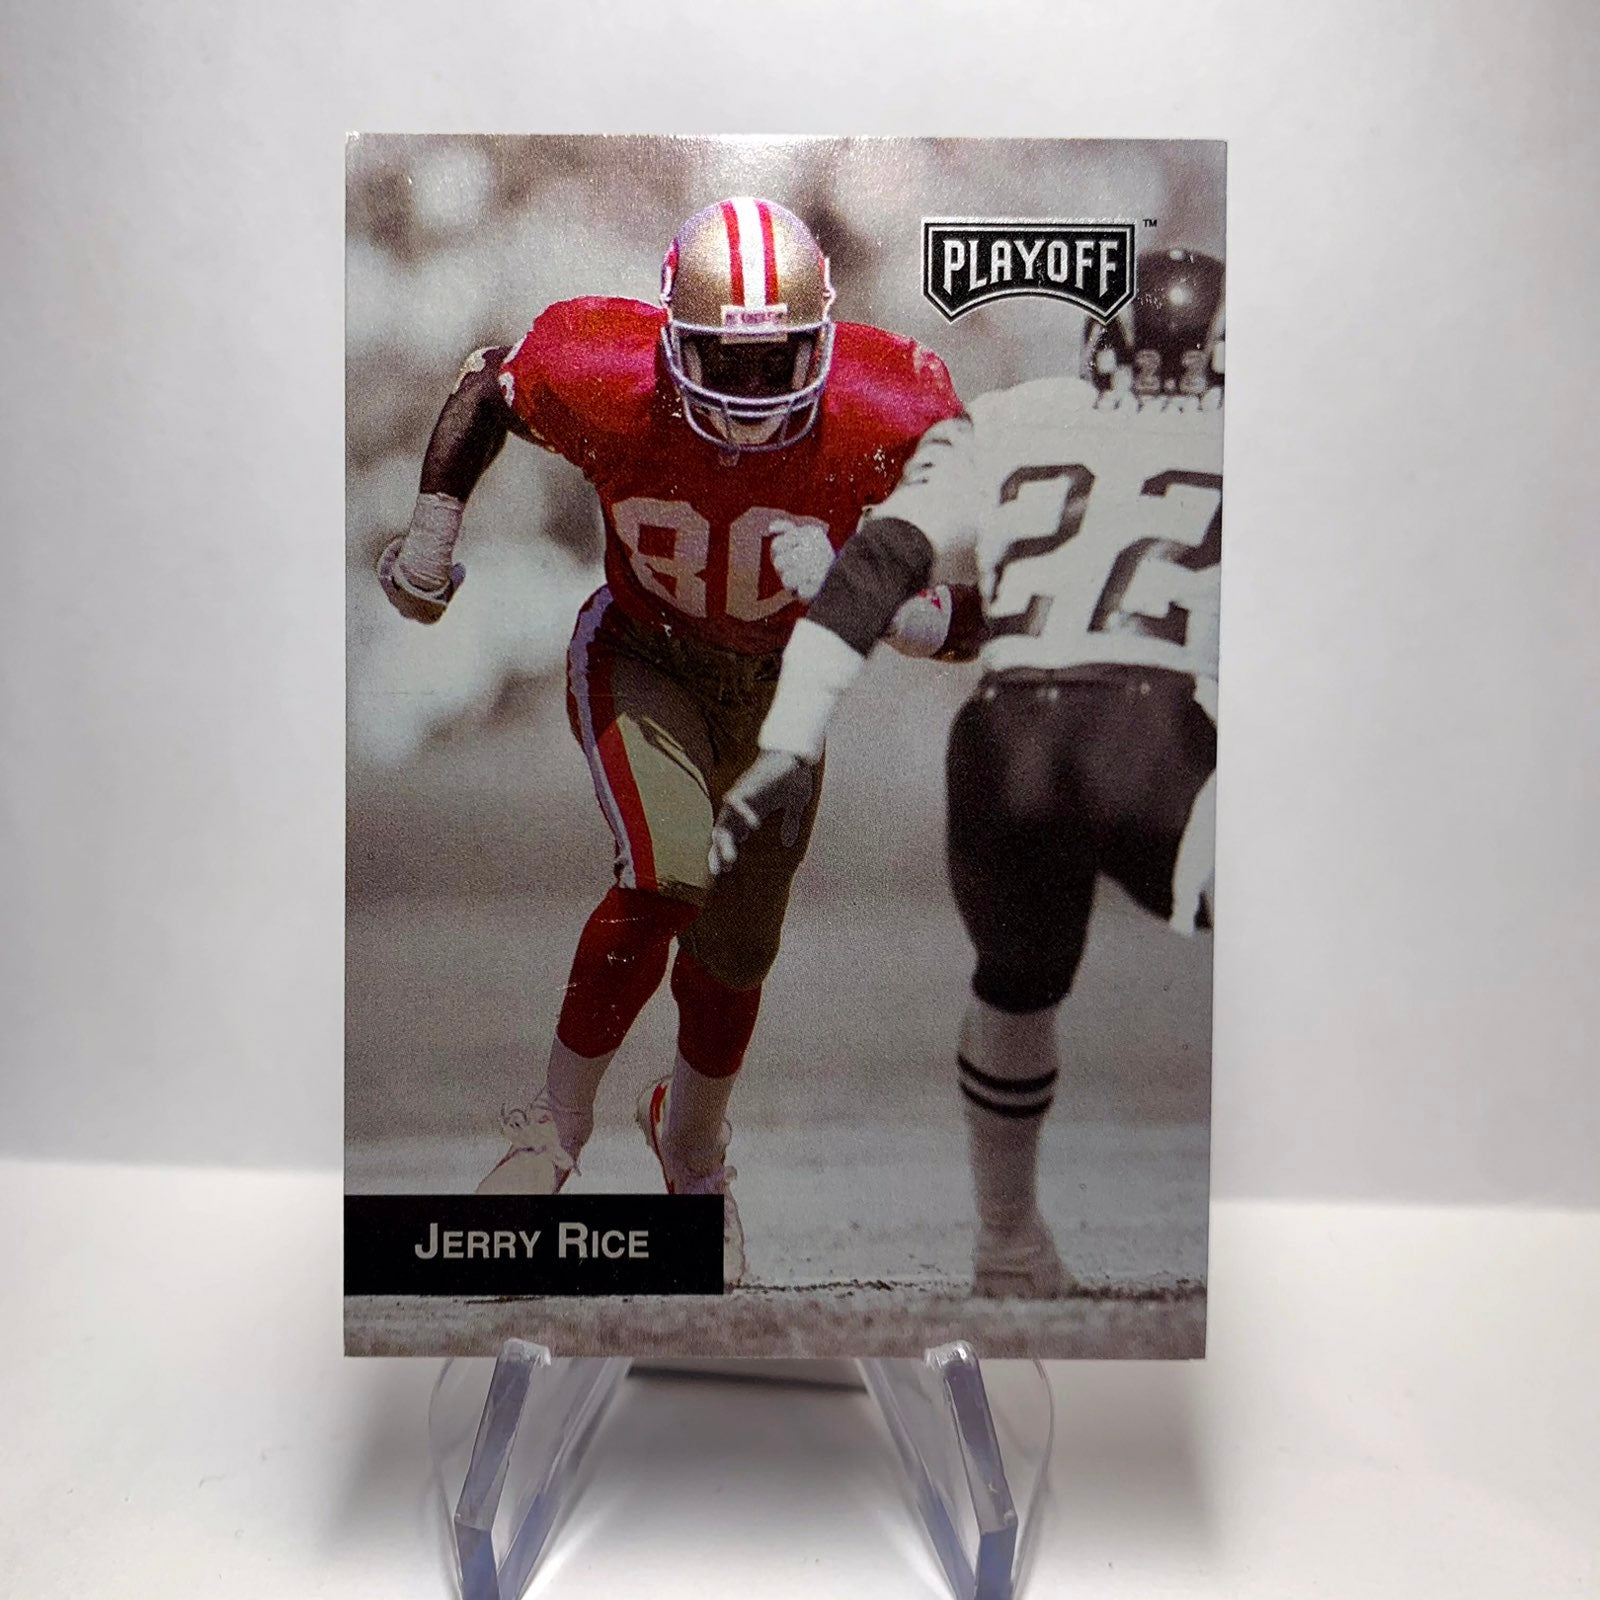 Vtg 1993 Jerry Rice NFL Card